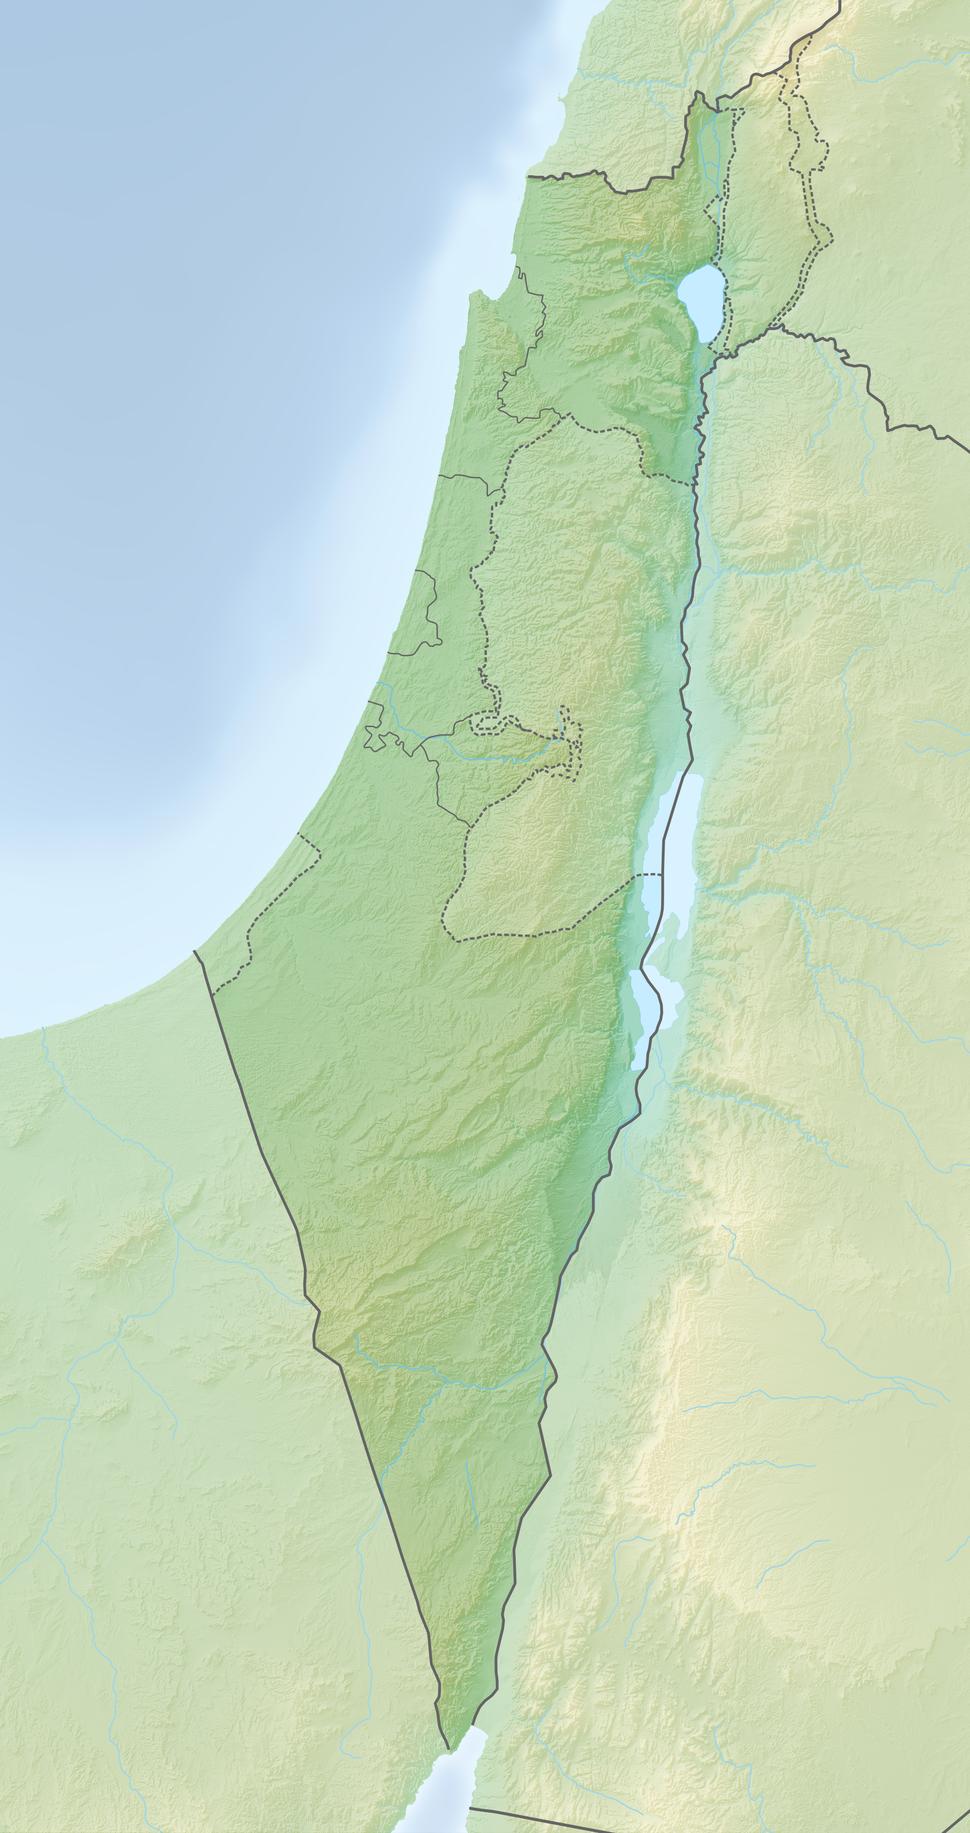 Reliefkarte Israel